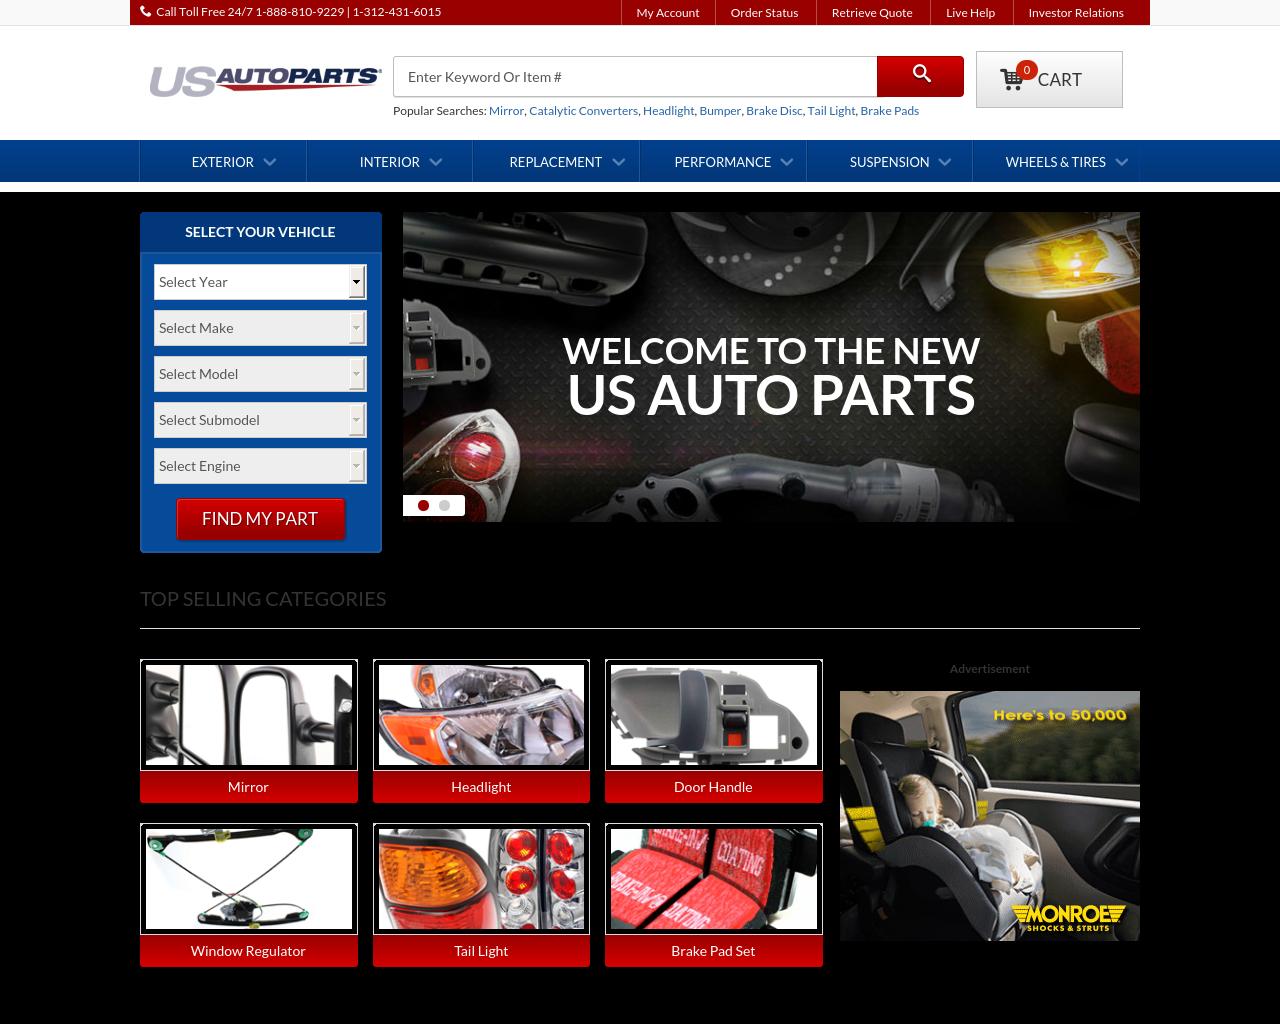 U.S.-Auto-Parts-Advertising-Reviews-Pricing